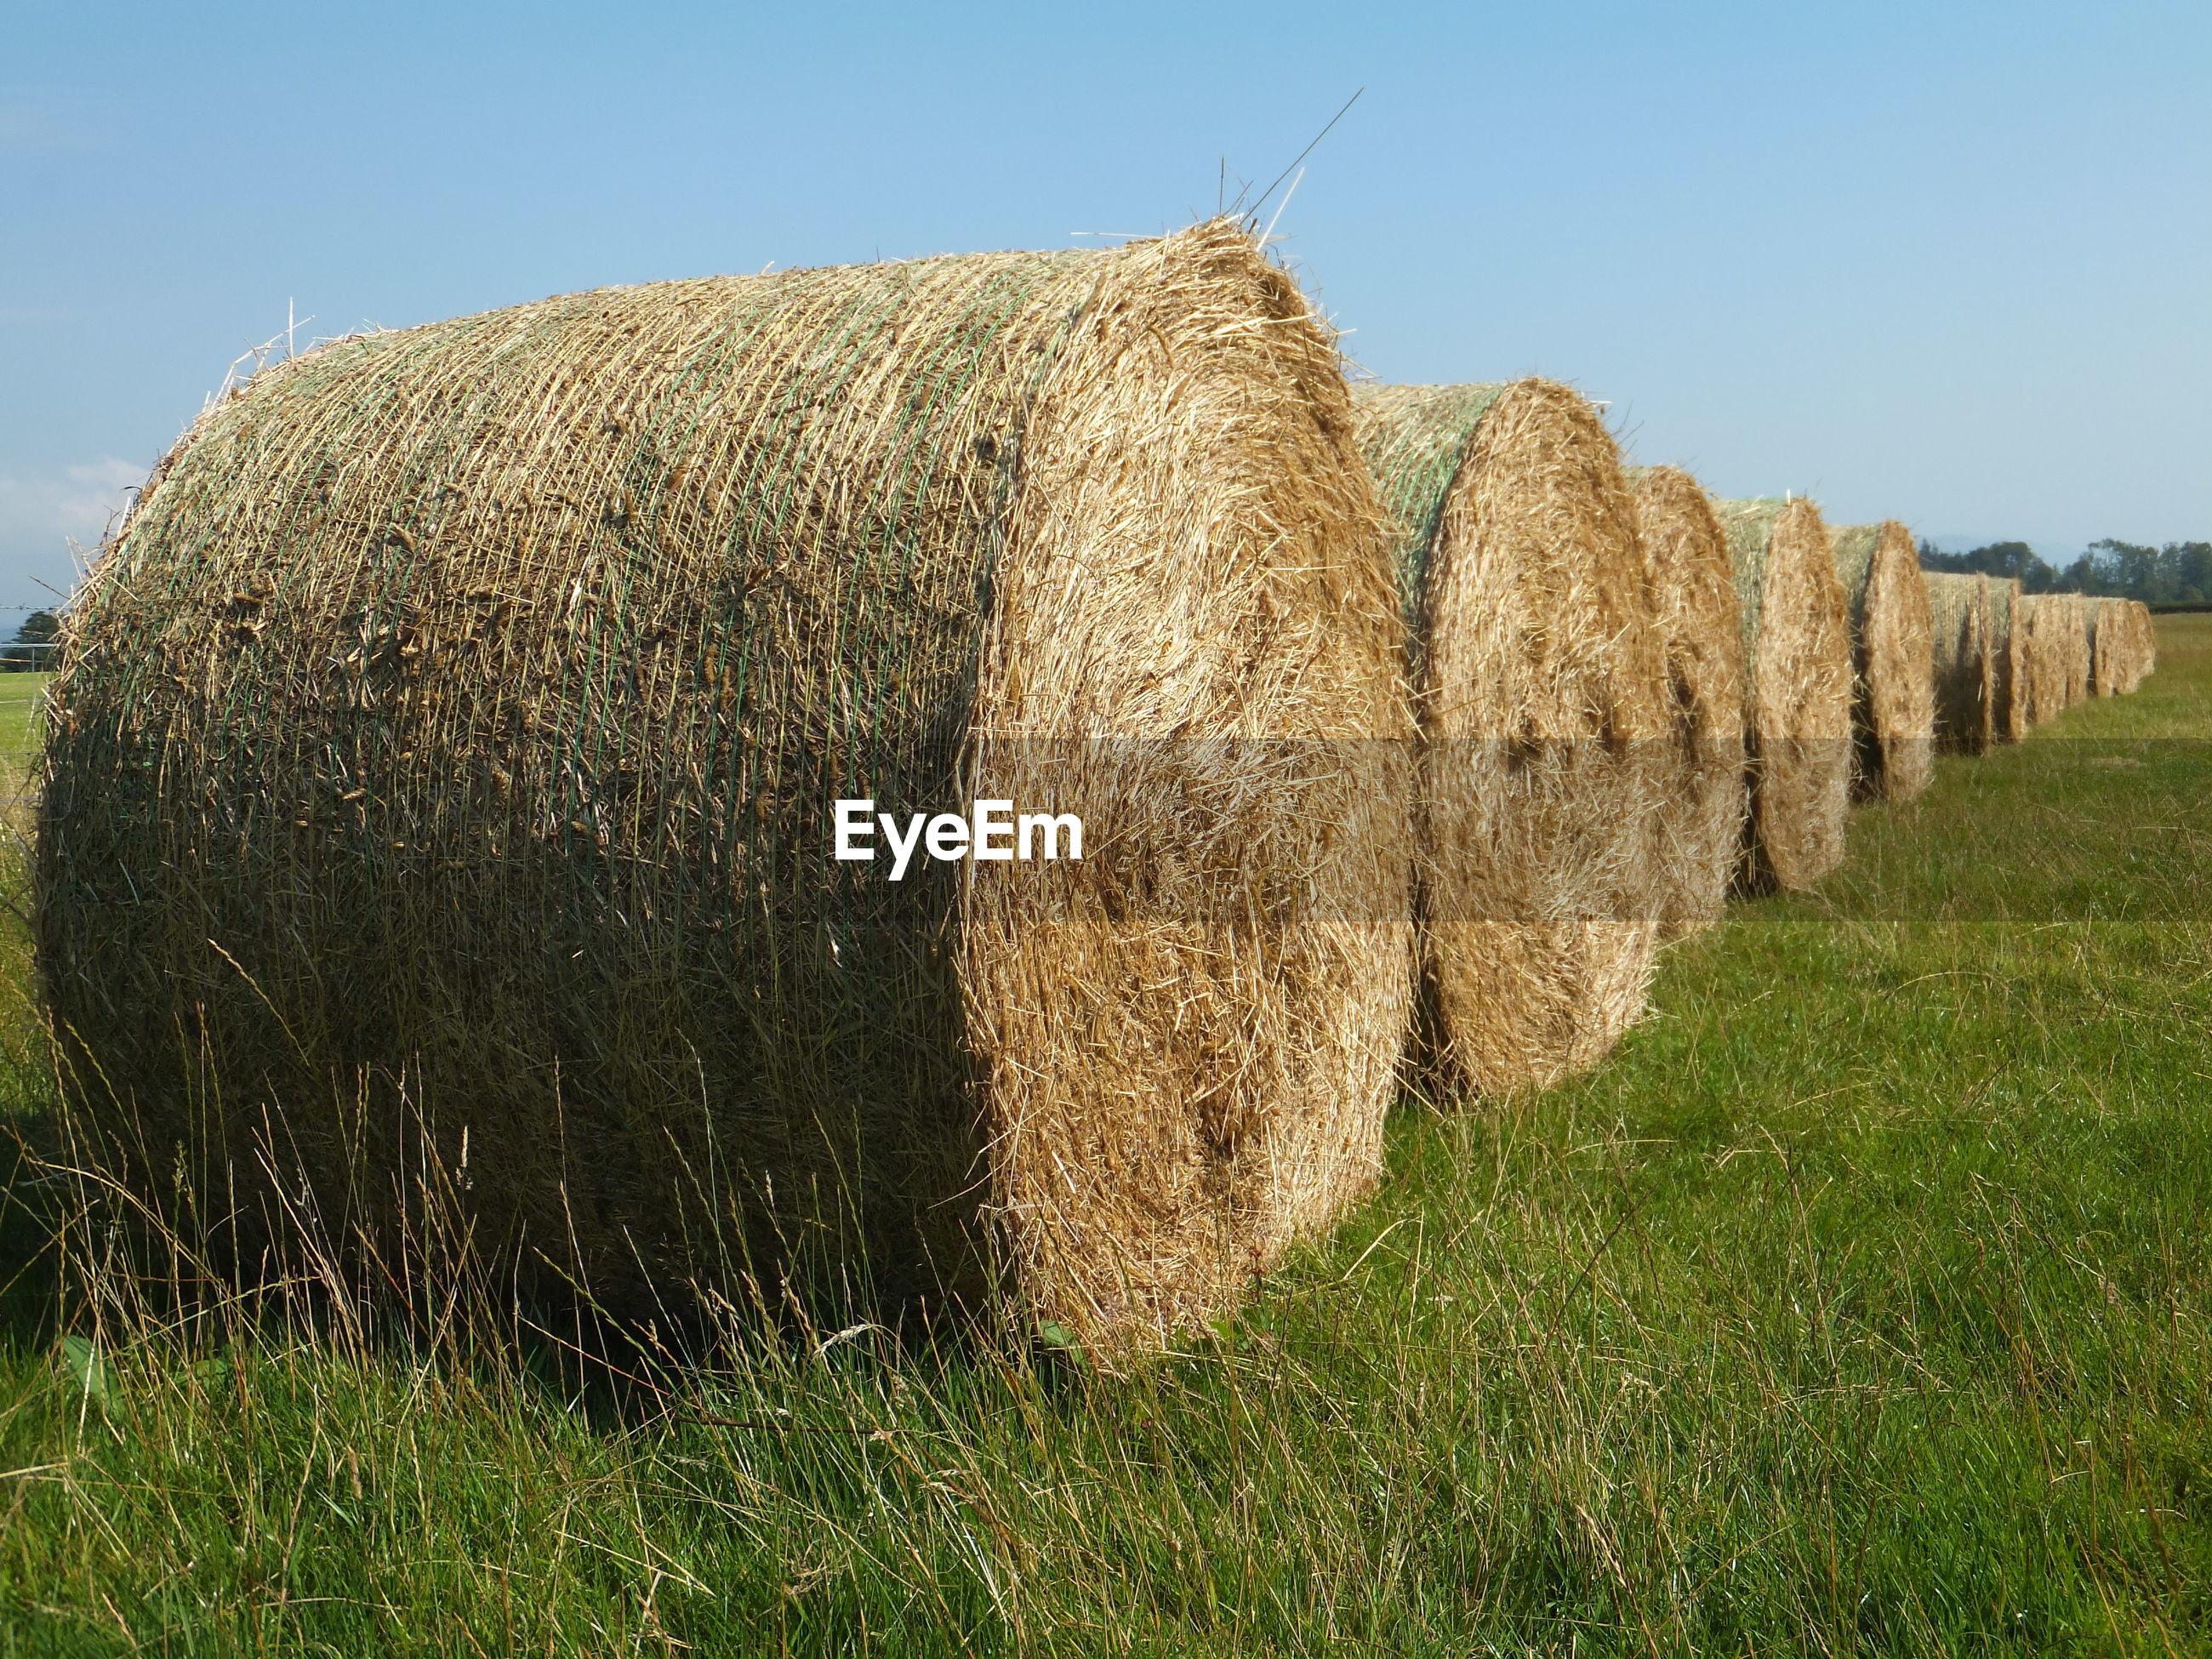 Hay bales on grassy field